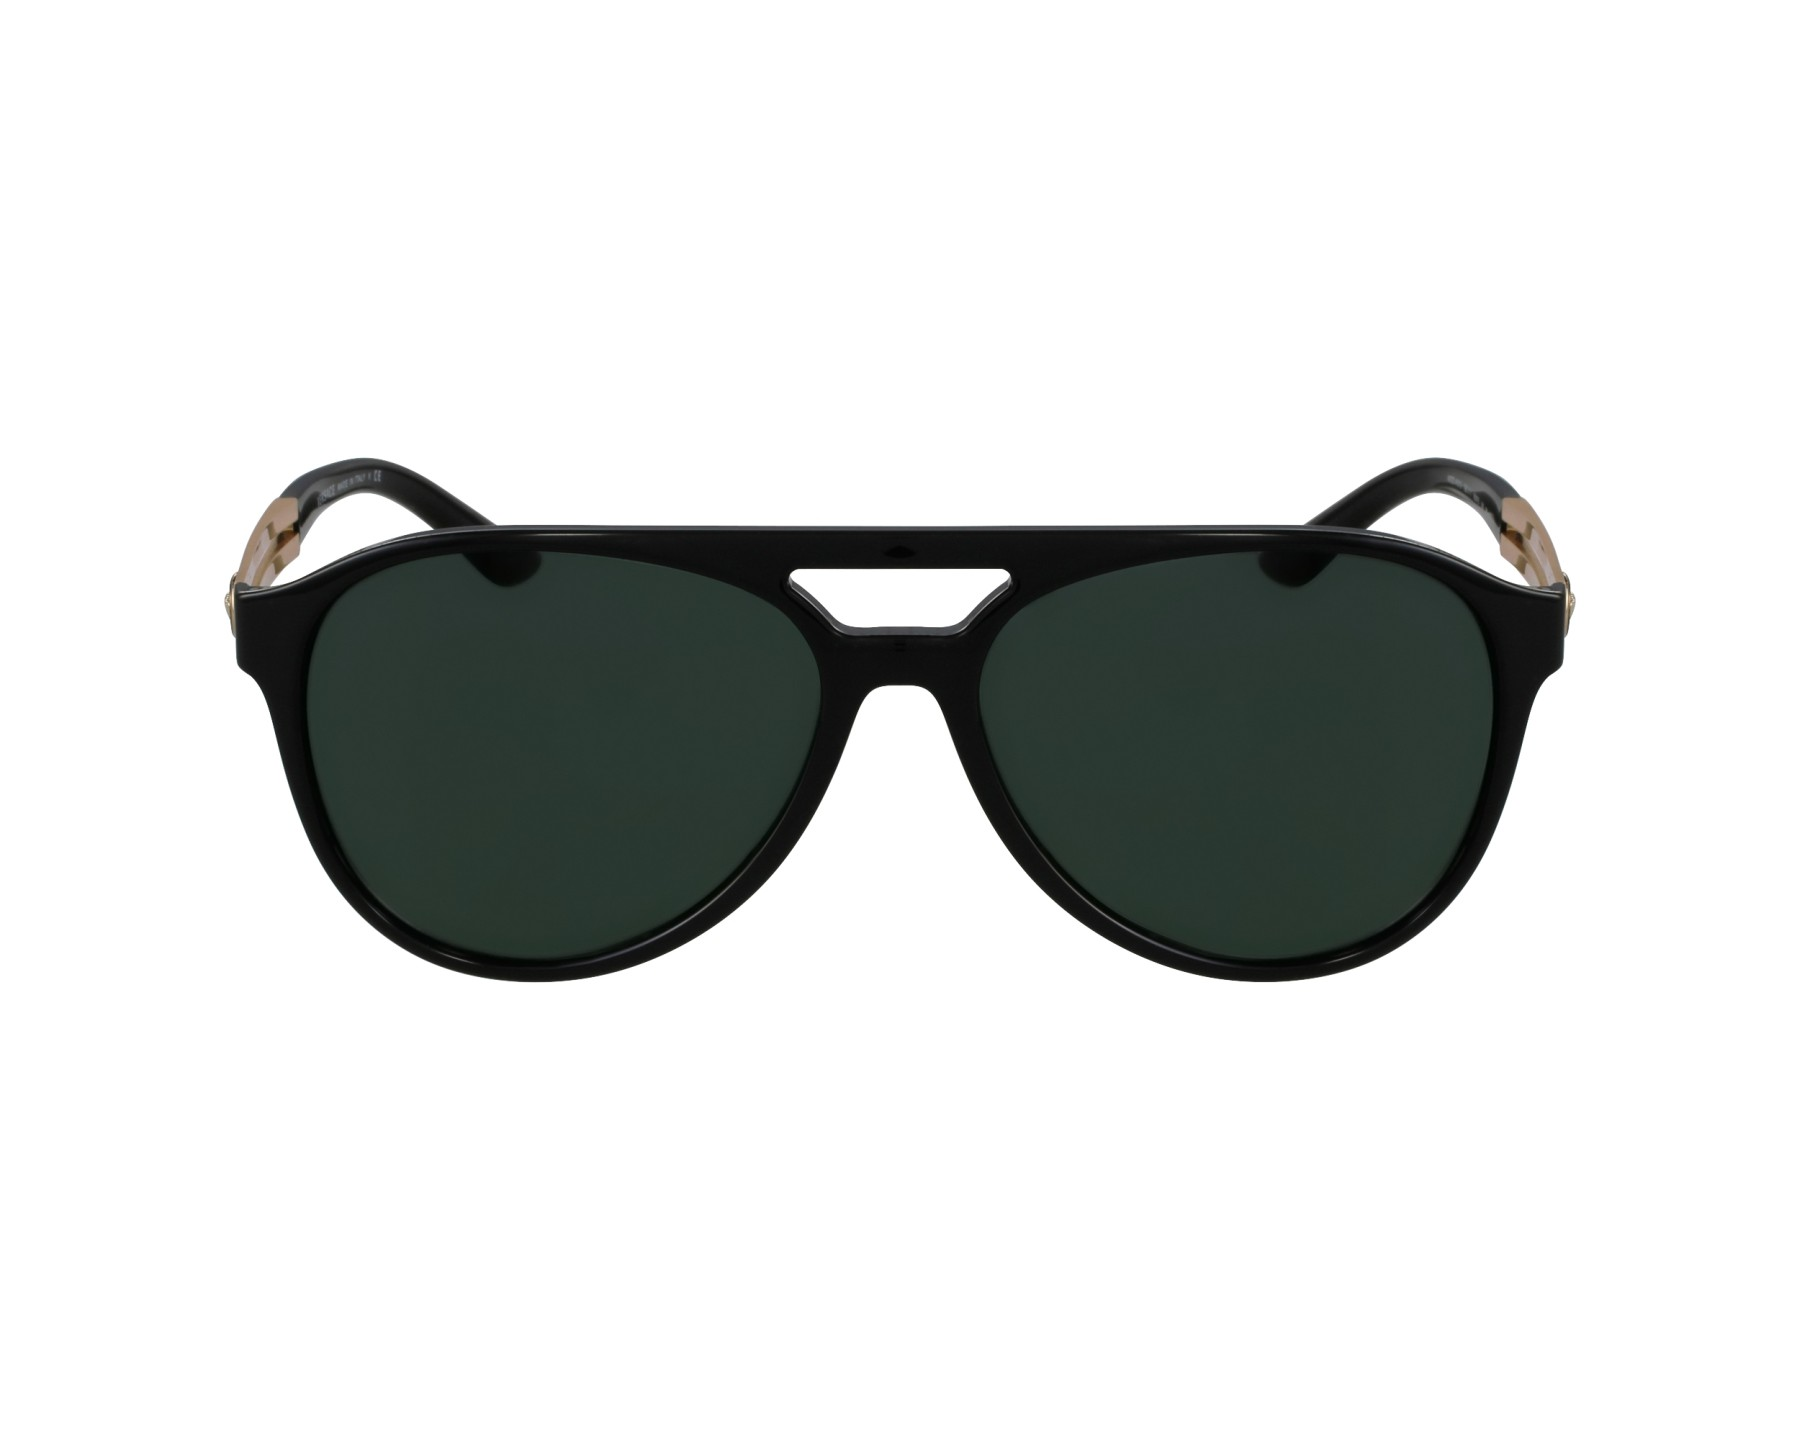 achat lunettes de soleil versace ve 4312 gb1 71 visionet. Black Bedroom Furniture Sets. Home Design Ideas